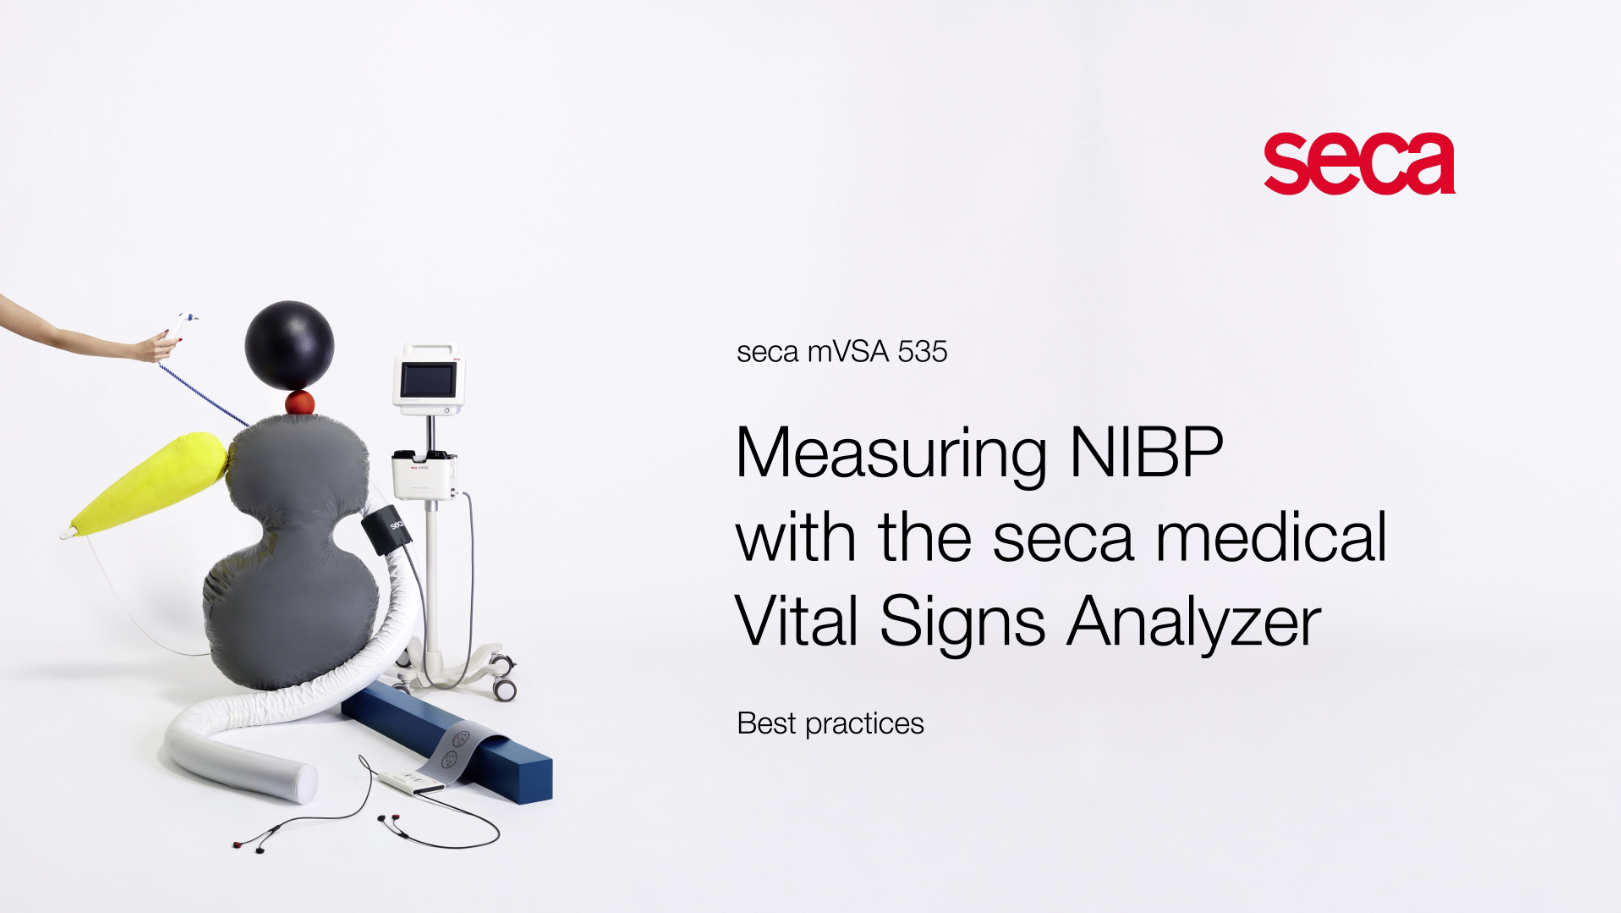 seca mVSA 535 - Medical Vital Signs Analyzer with